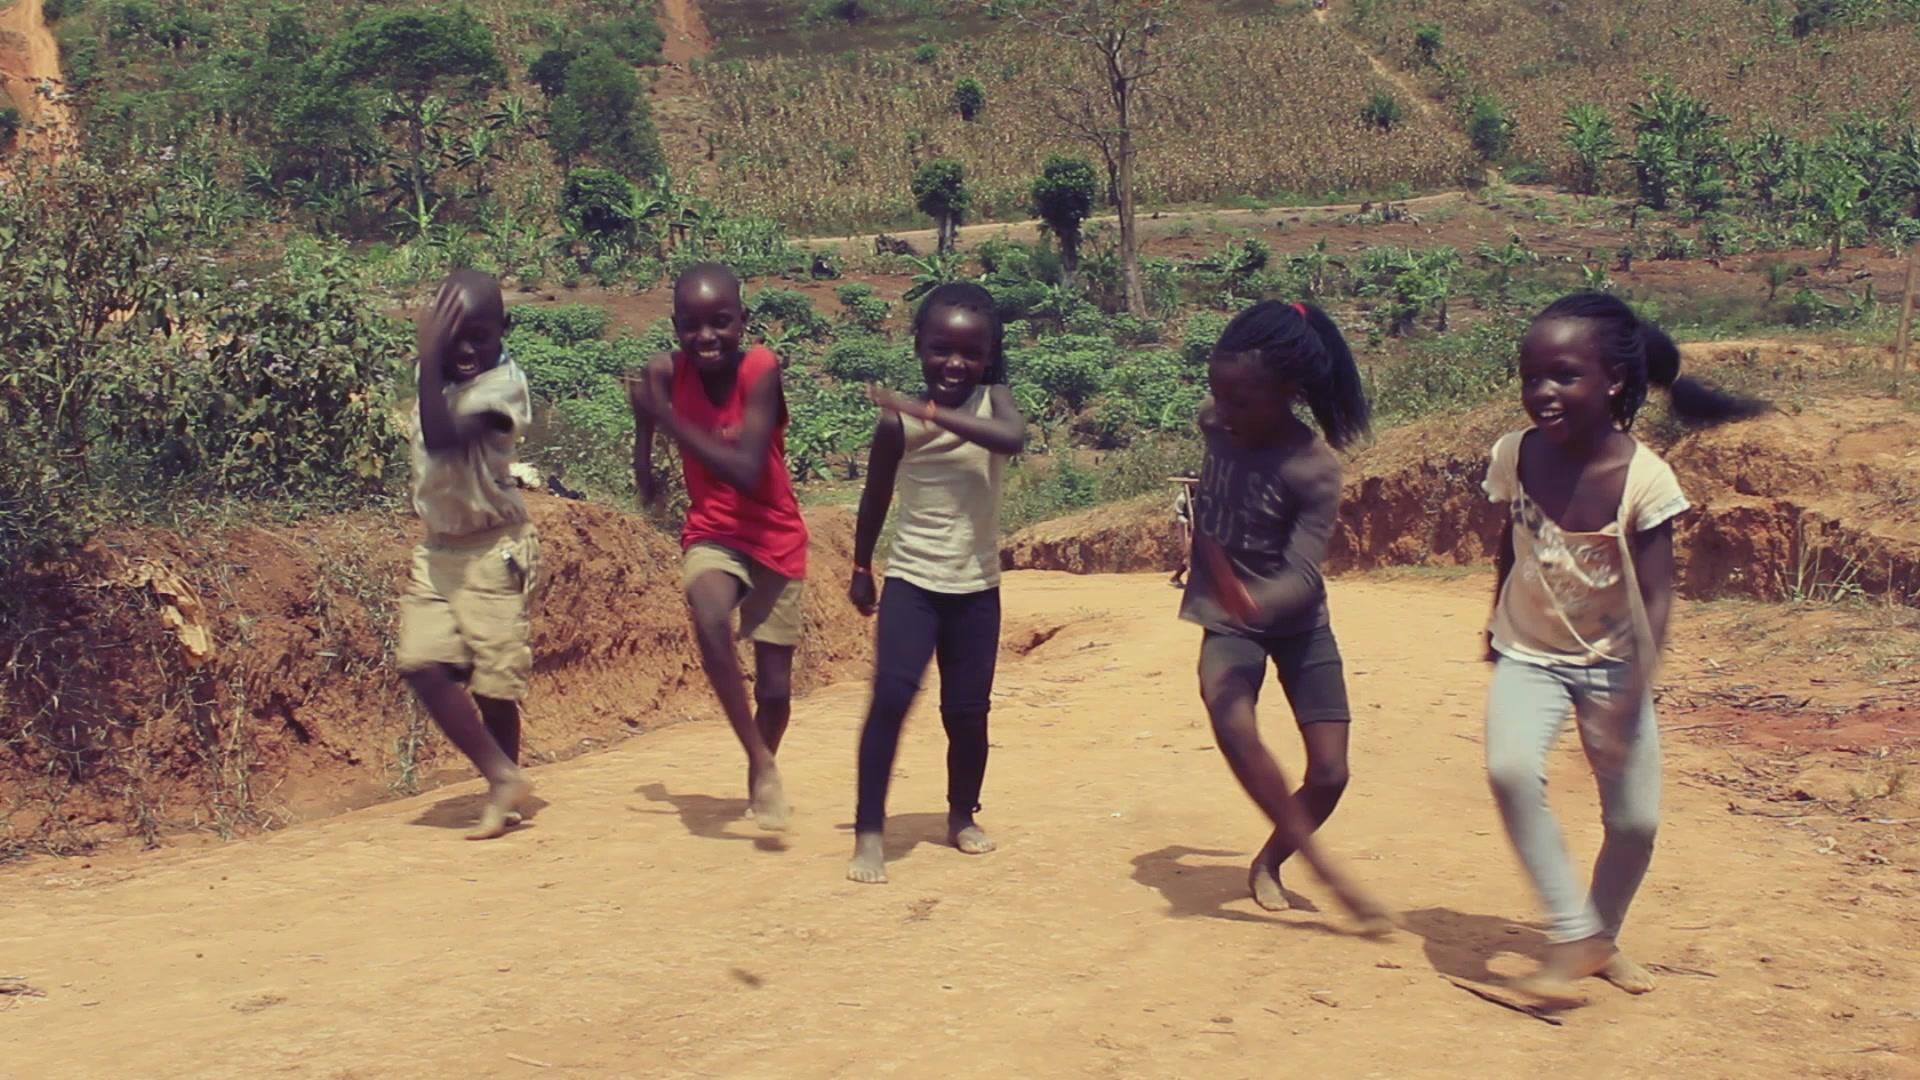 I LOVE YOU AFRICA (DANCE VIDEO)